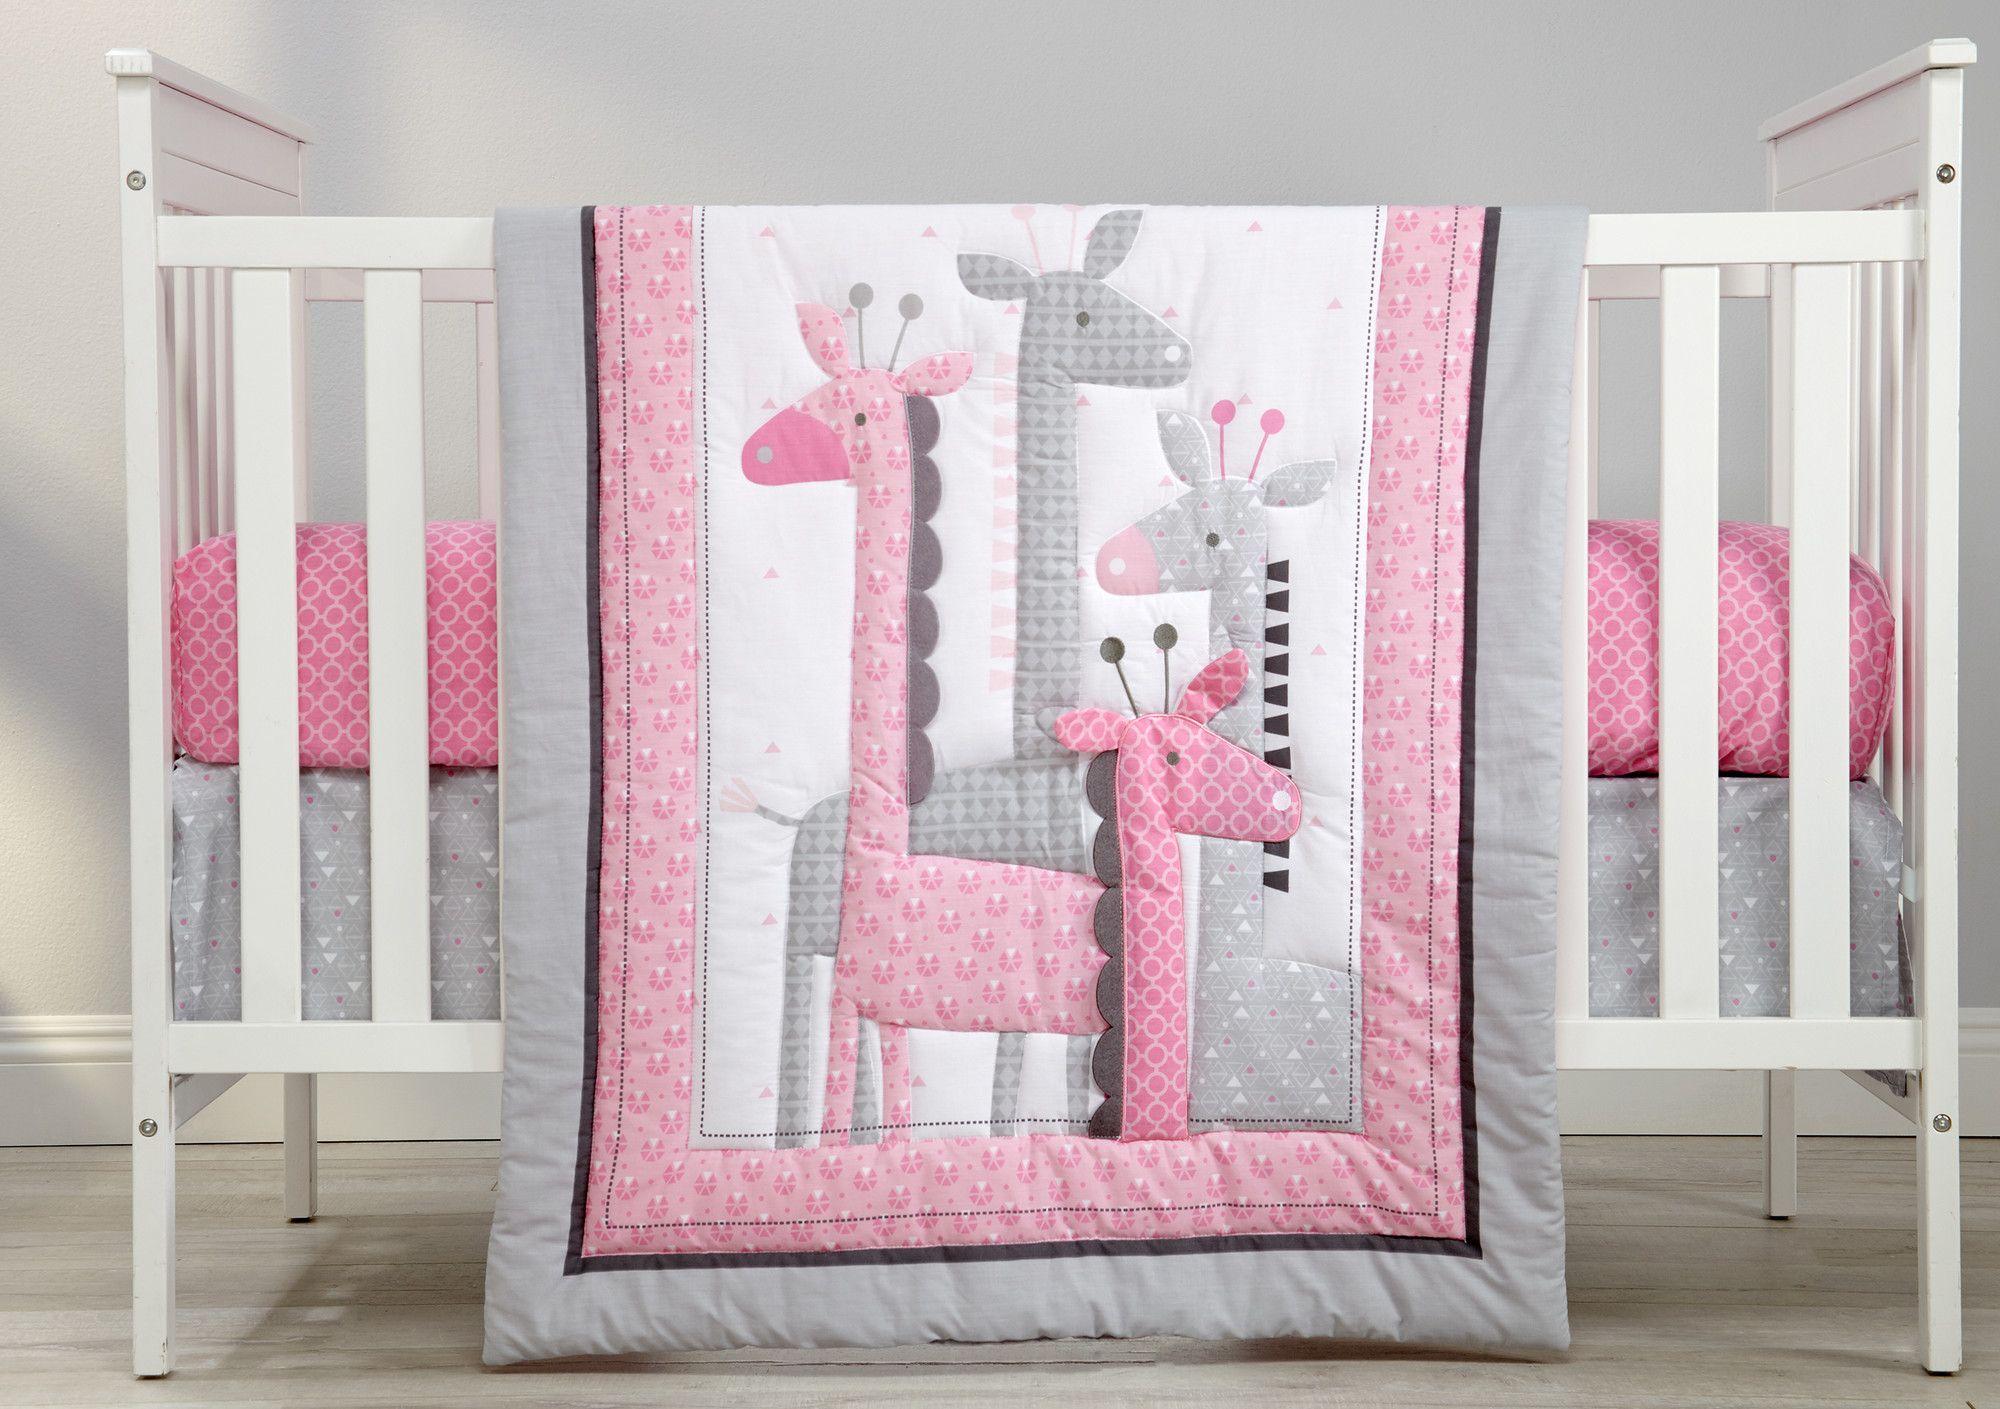 Baby Crib Bedding Set for Girls 3 Pieces Pink Giraffe Elephant Originals Soft Toddler Nursery Bedding Sets with Crib Comforter Fitted Crib Sheet Crib Skirt for Standard Size Crib